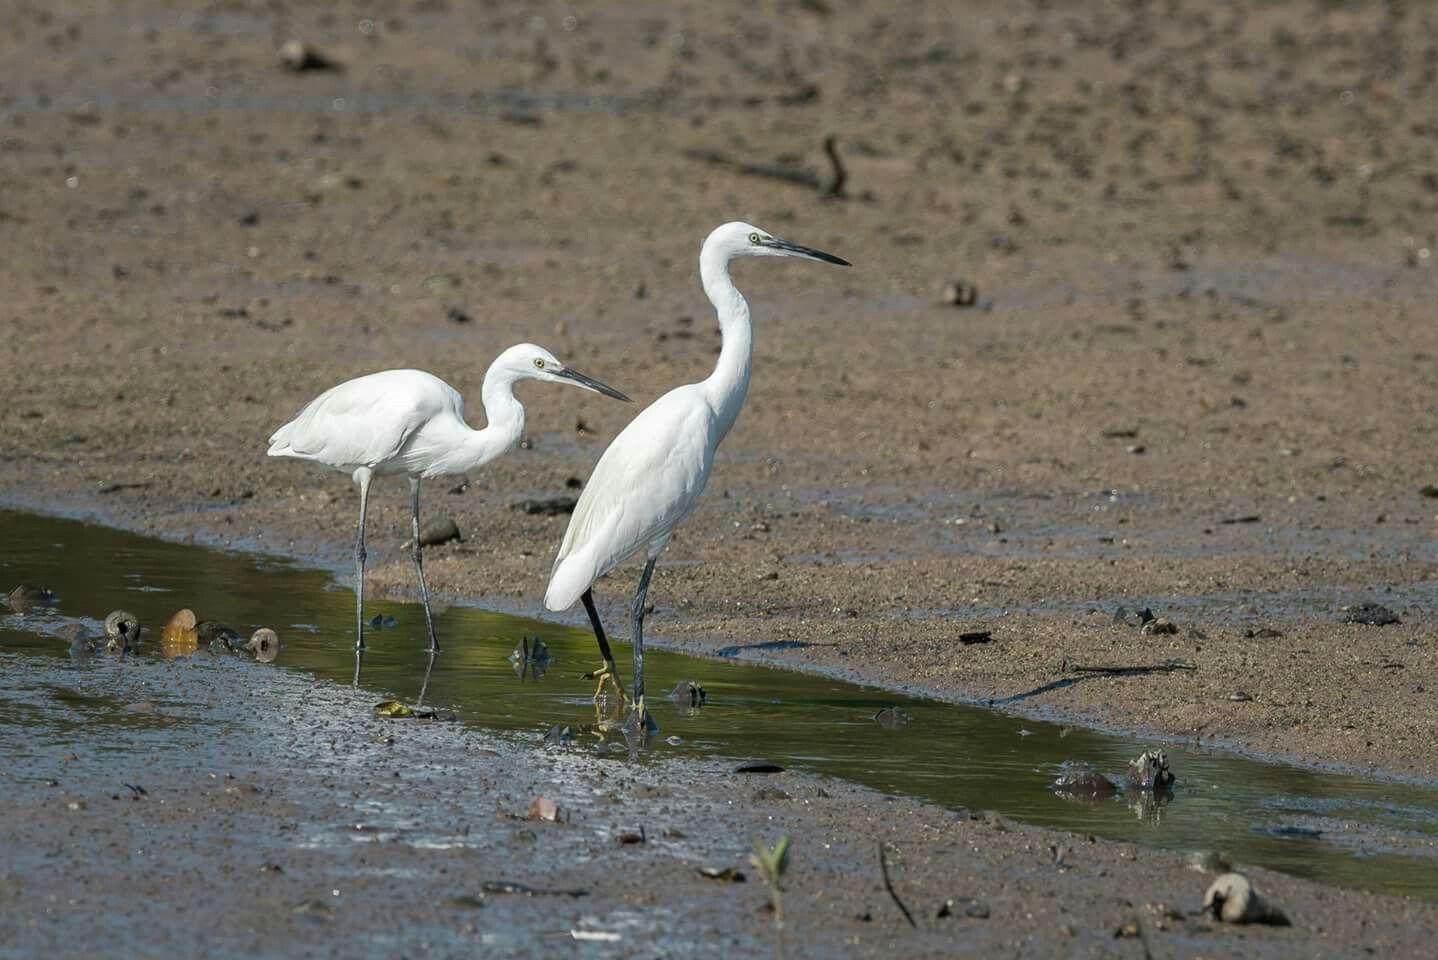 Little Egret #bird #nature #wildlife #egret #shorebird #animal #photography #nikon #telephoto